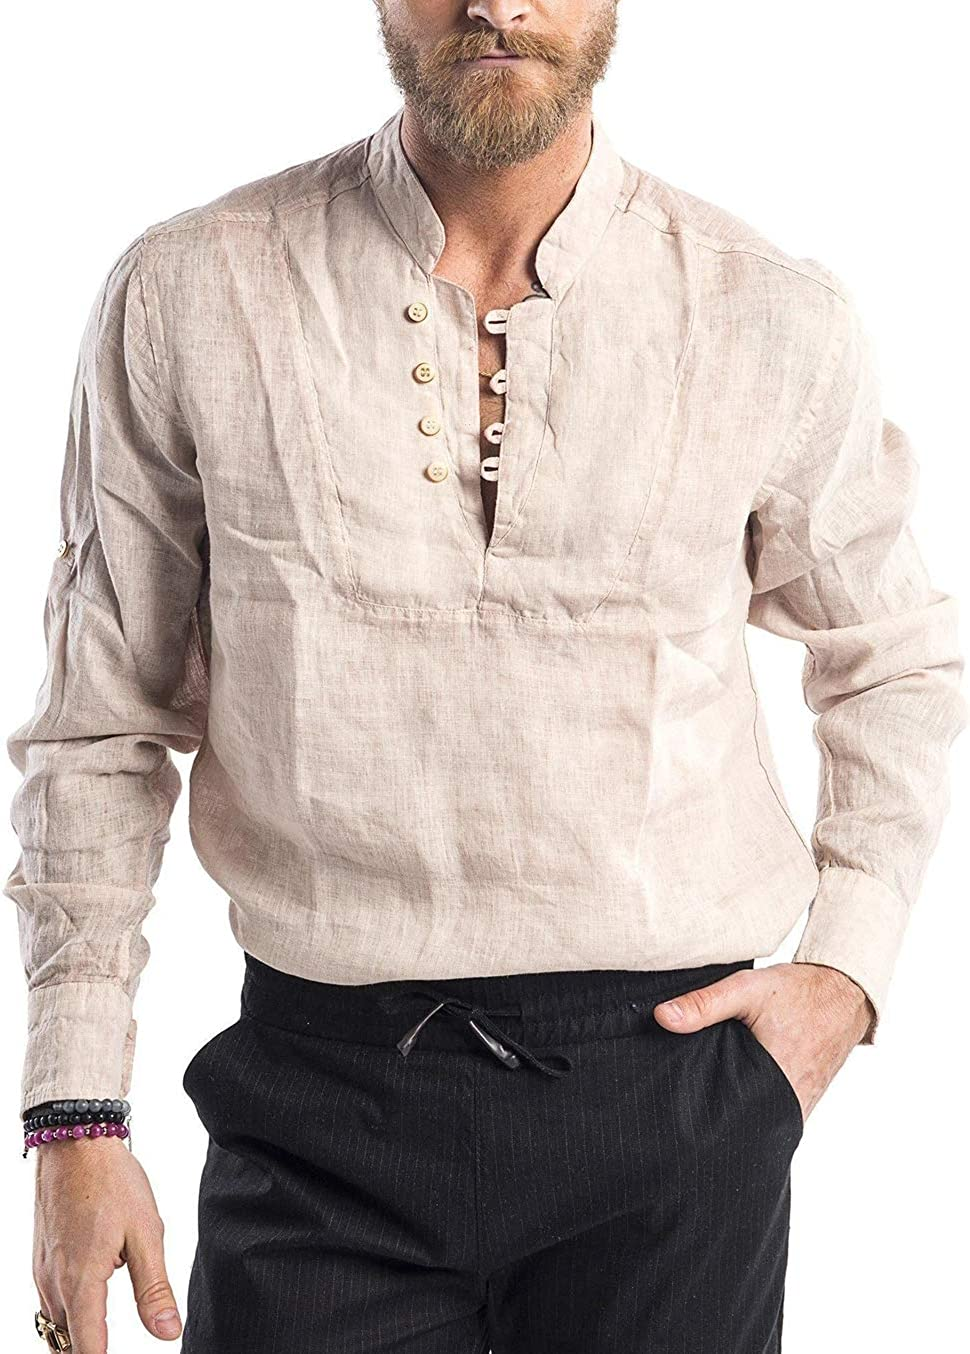 Karlywindow Mens Casual Cotton Shirt Long Sleeve Button Down Lightweight Basic Beach Yoga Tops